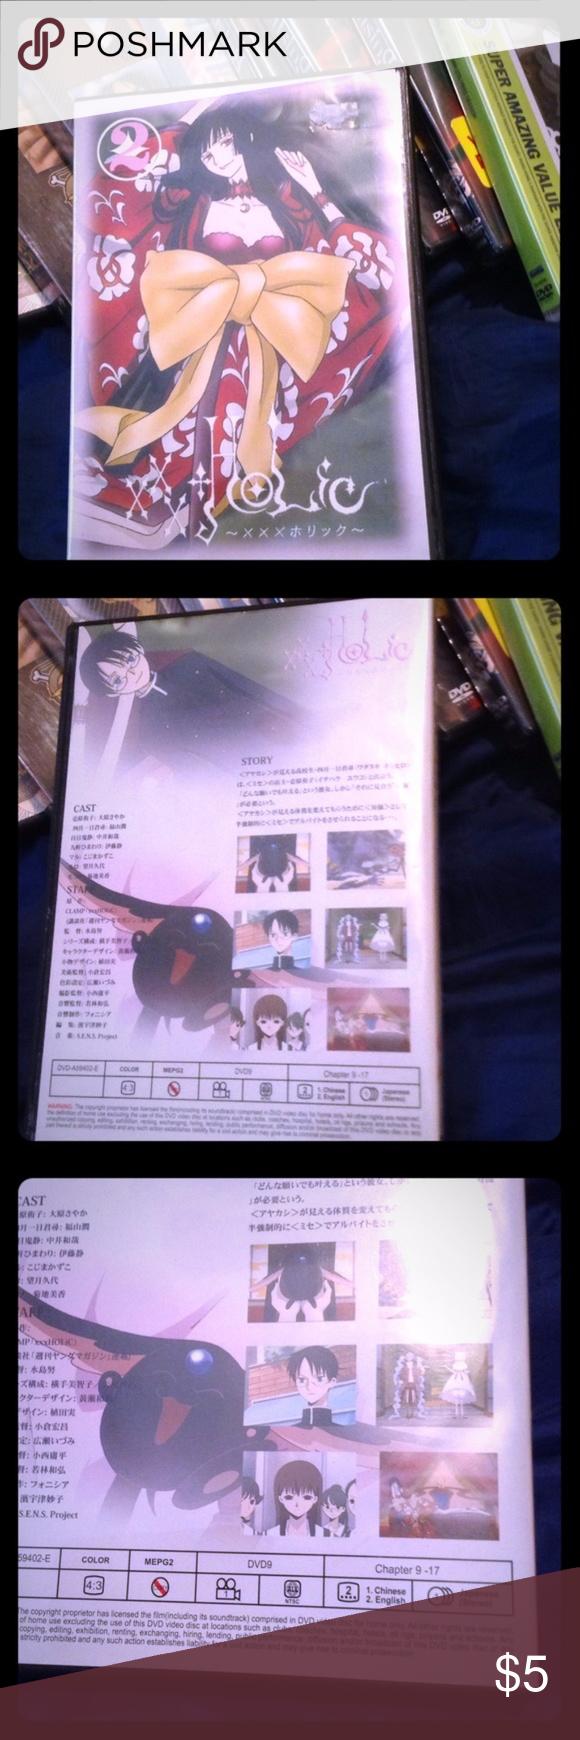 xxxHolic DVD Season 1 Vol. 2 CLAMP Anime for sale This is